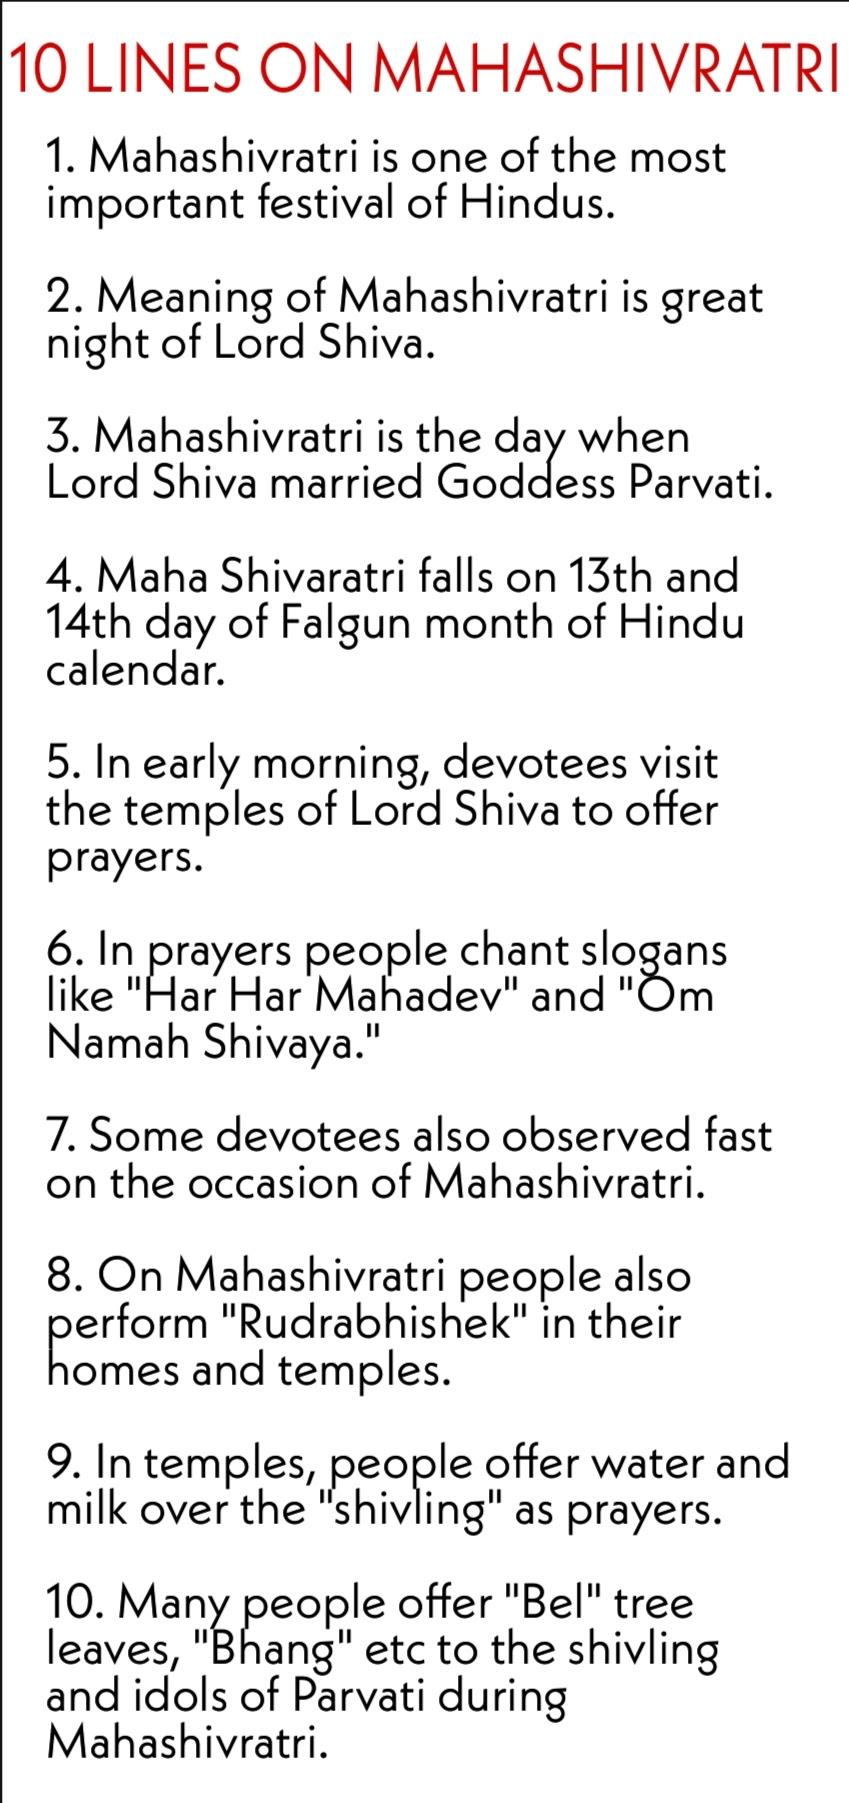 10 Lines on Mahashivratri